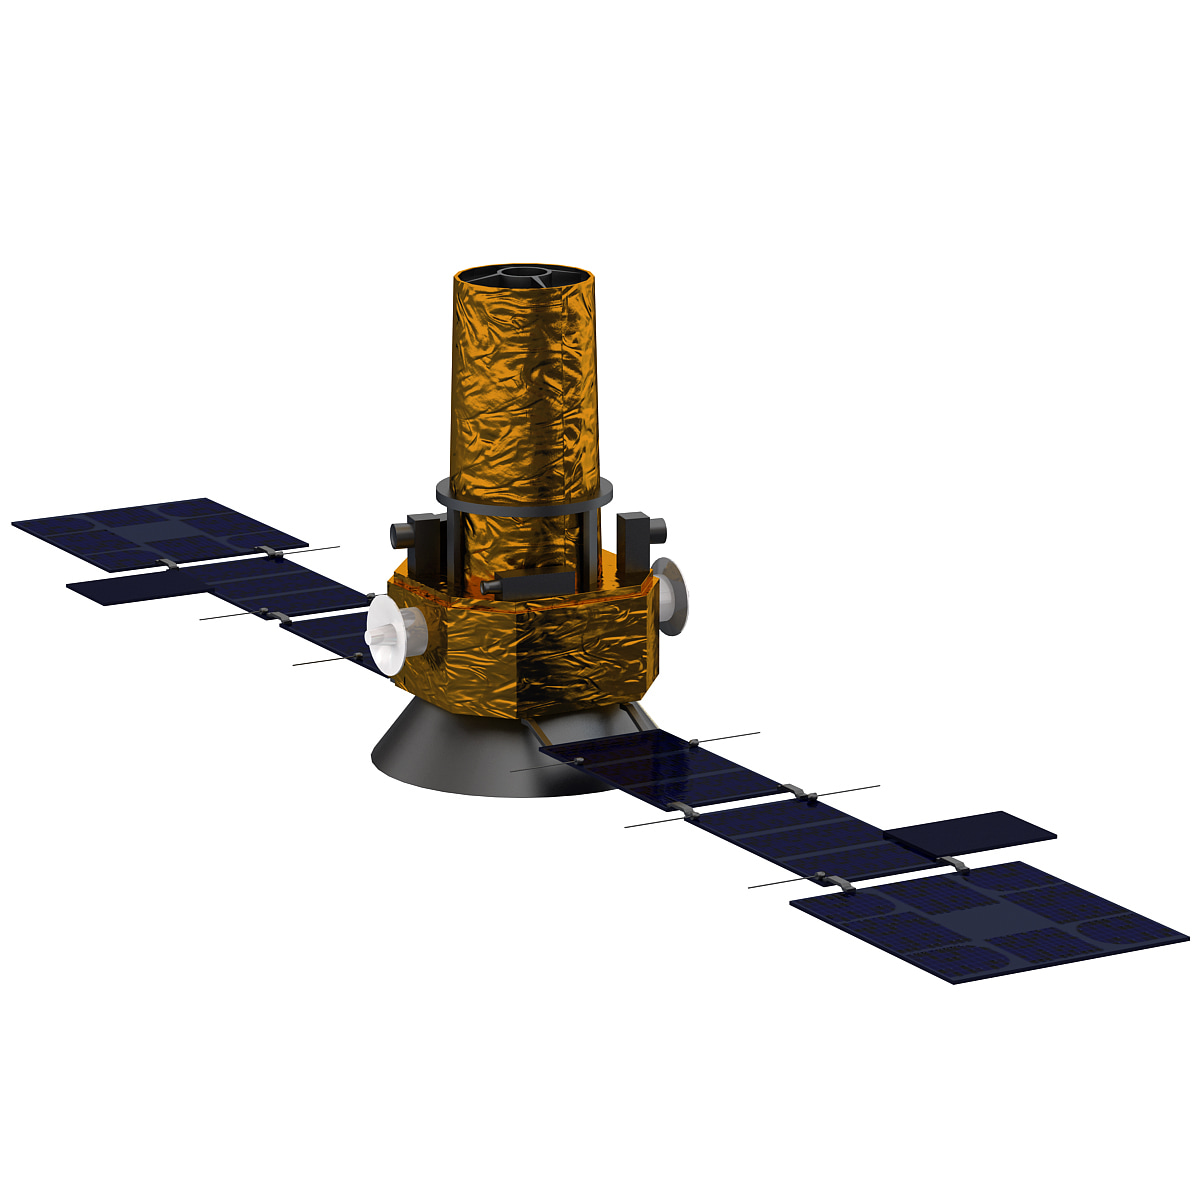 Air_Force_Research_satellite_TacSat_2_001.jpg